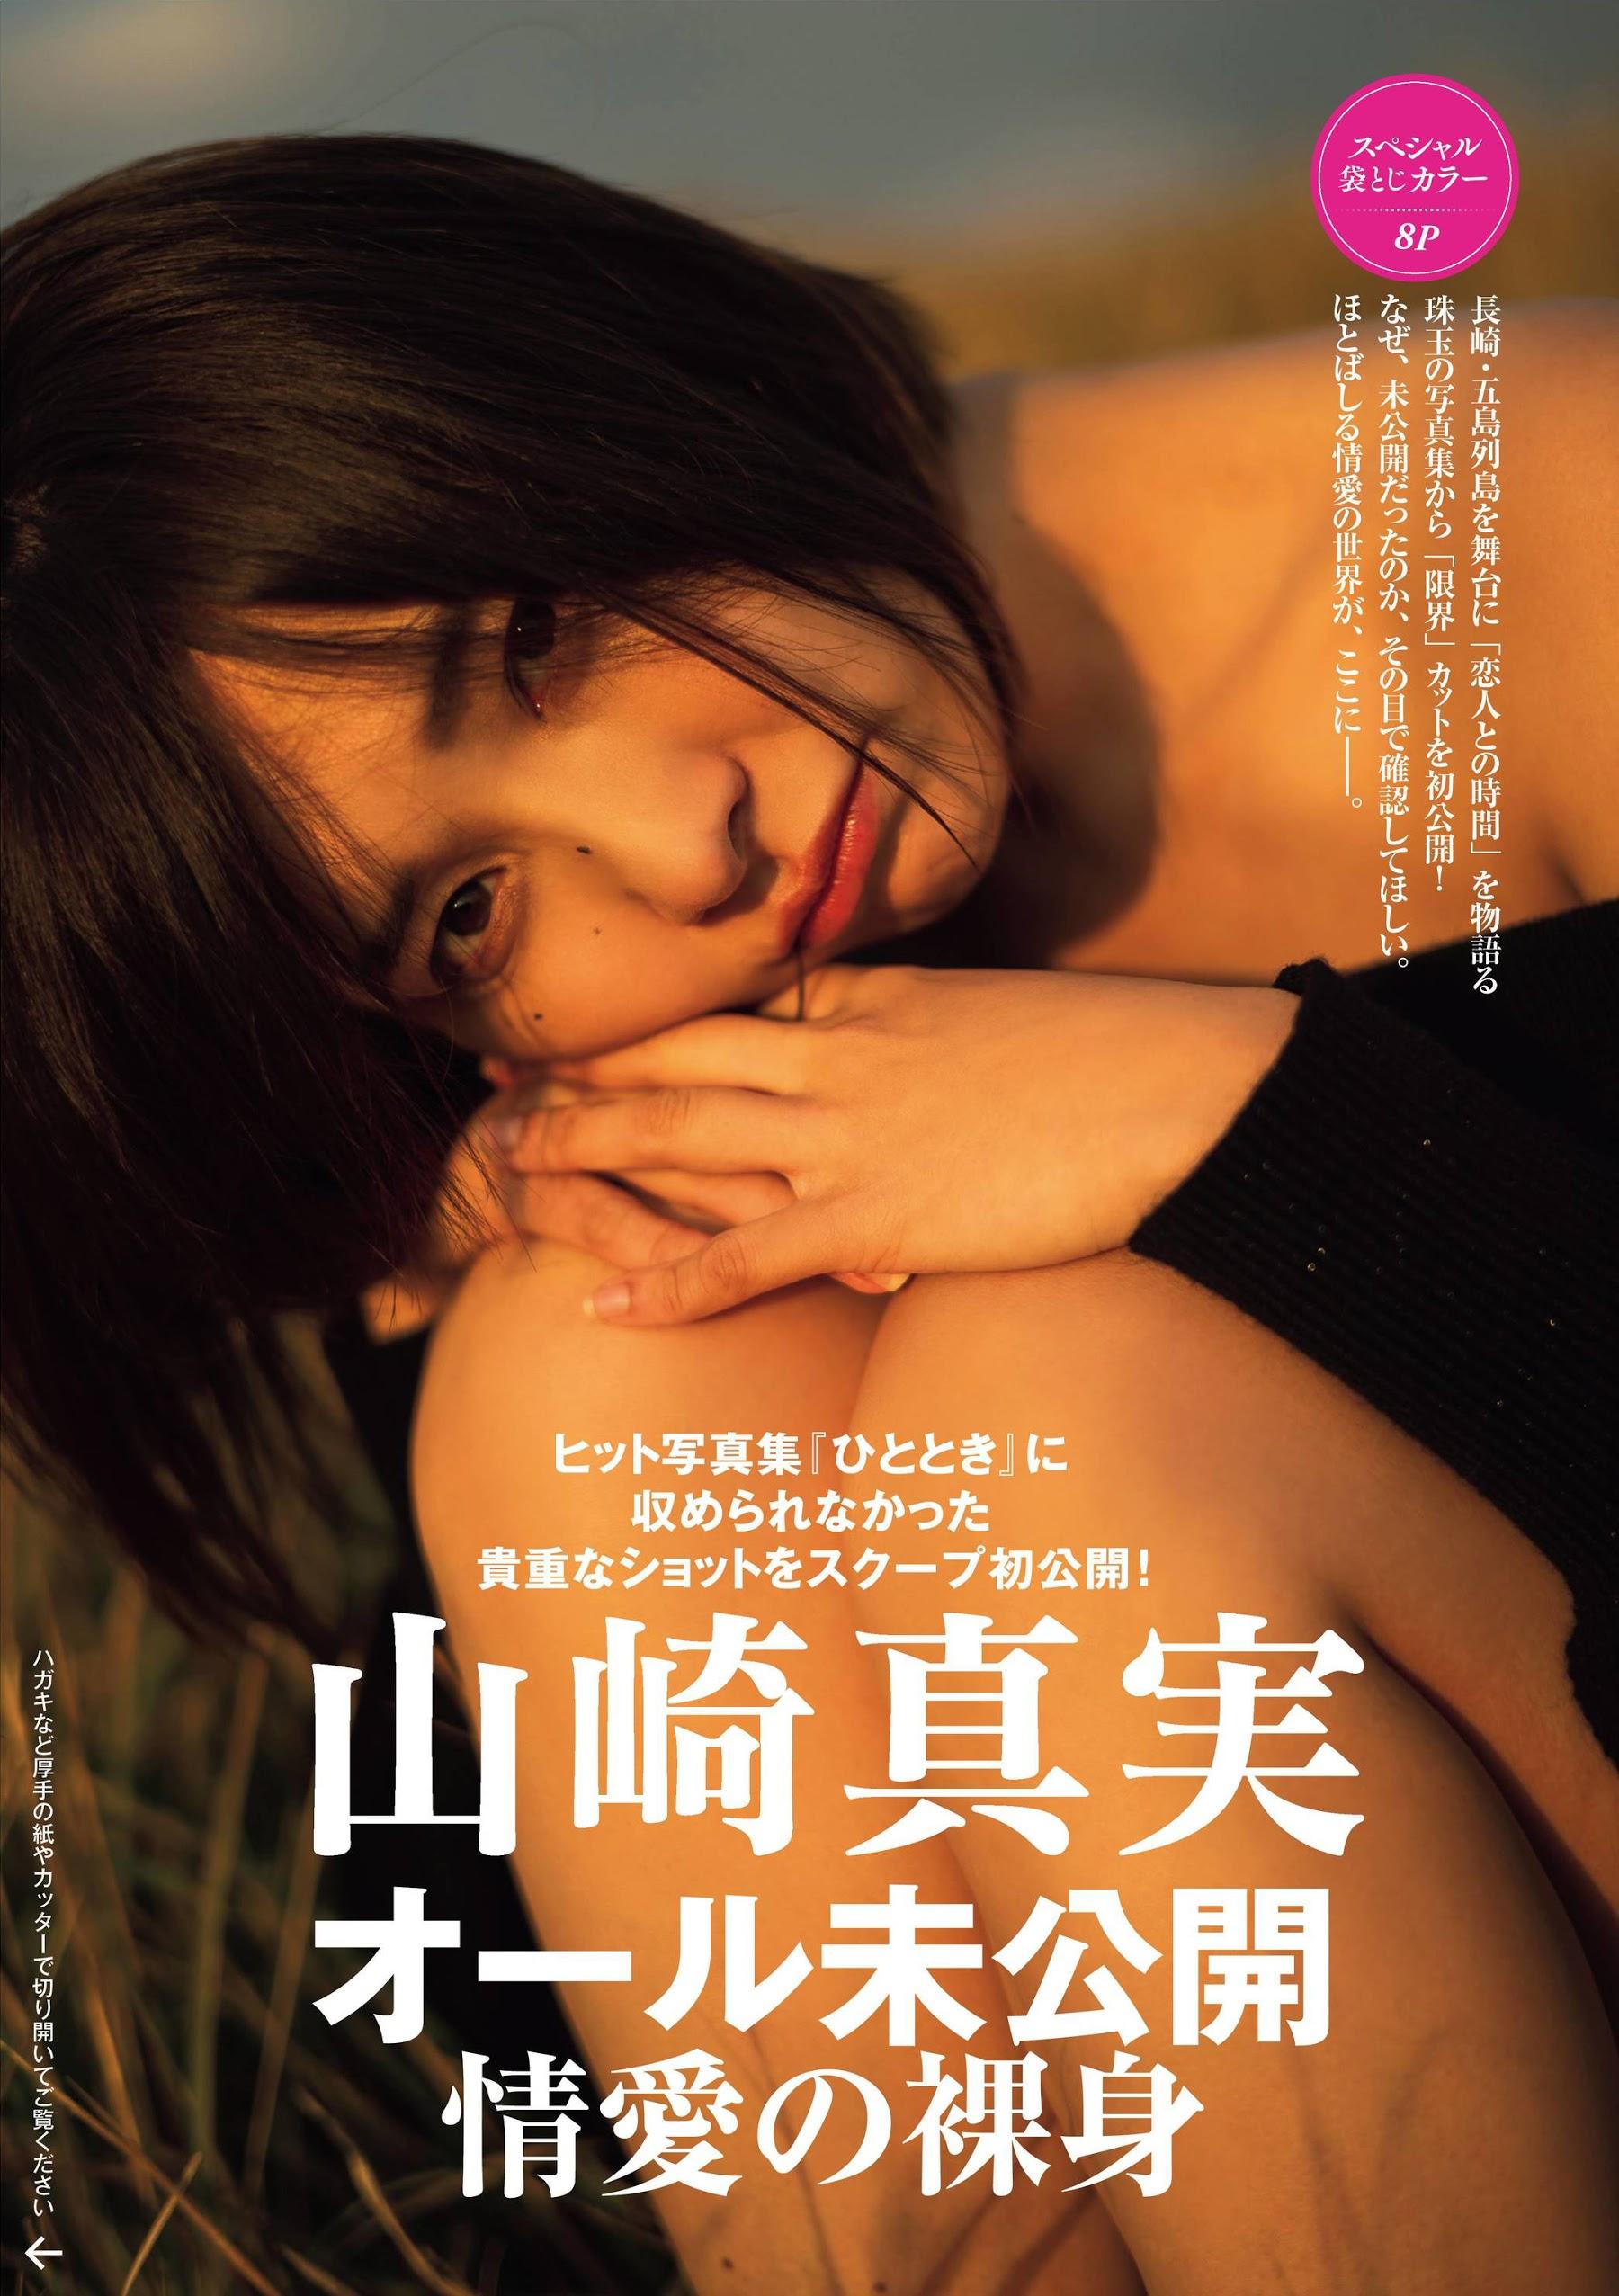 Yamazaki Mami Nude of Love 2020001